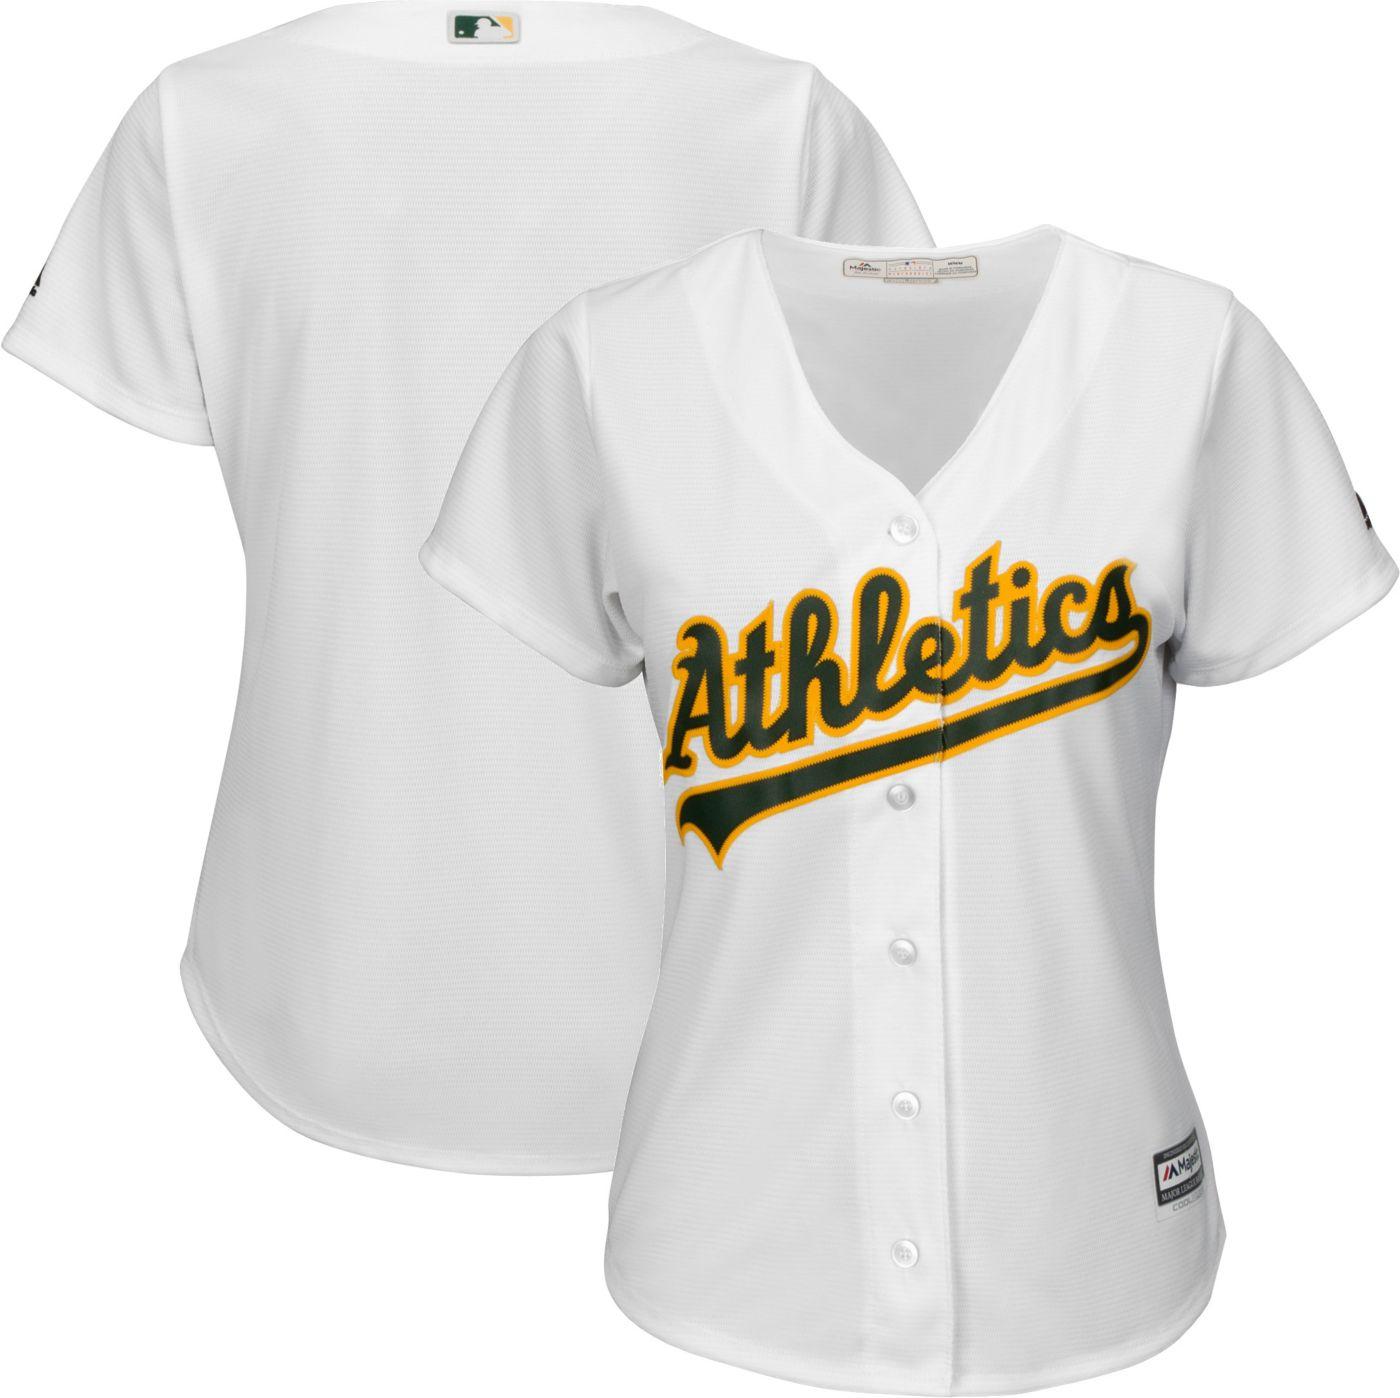 Majestic Women's Replica Oakland Athletics Cool Base Home White Jersey